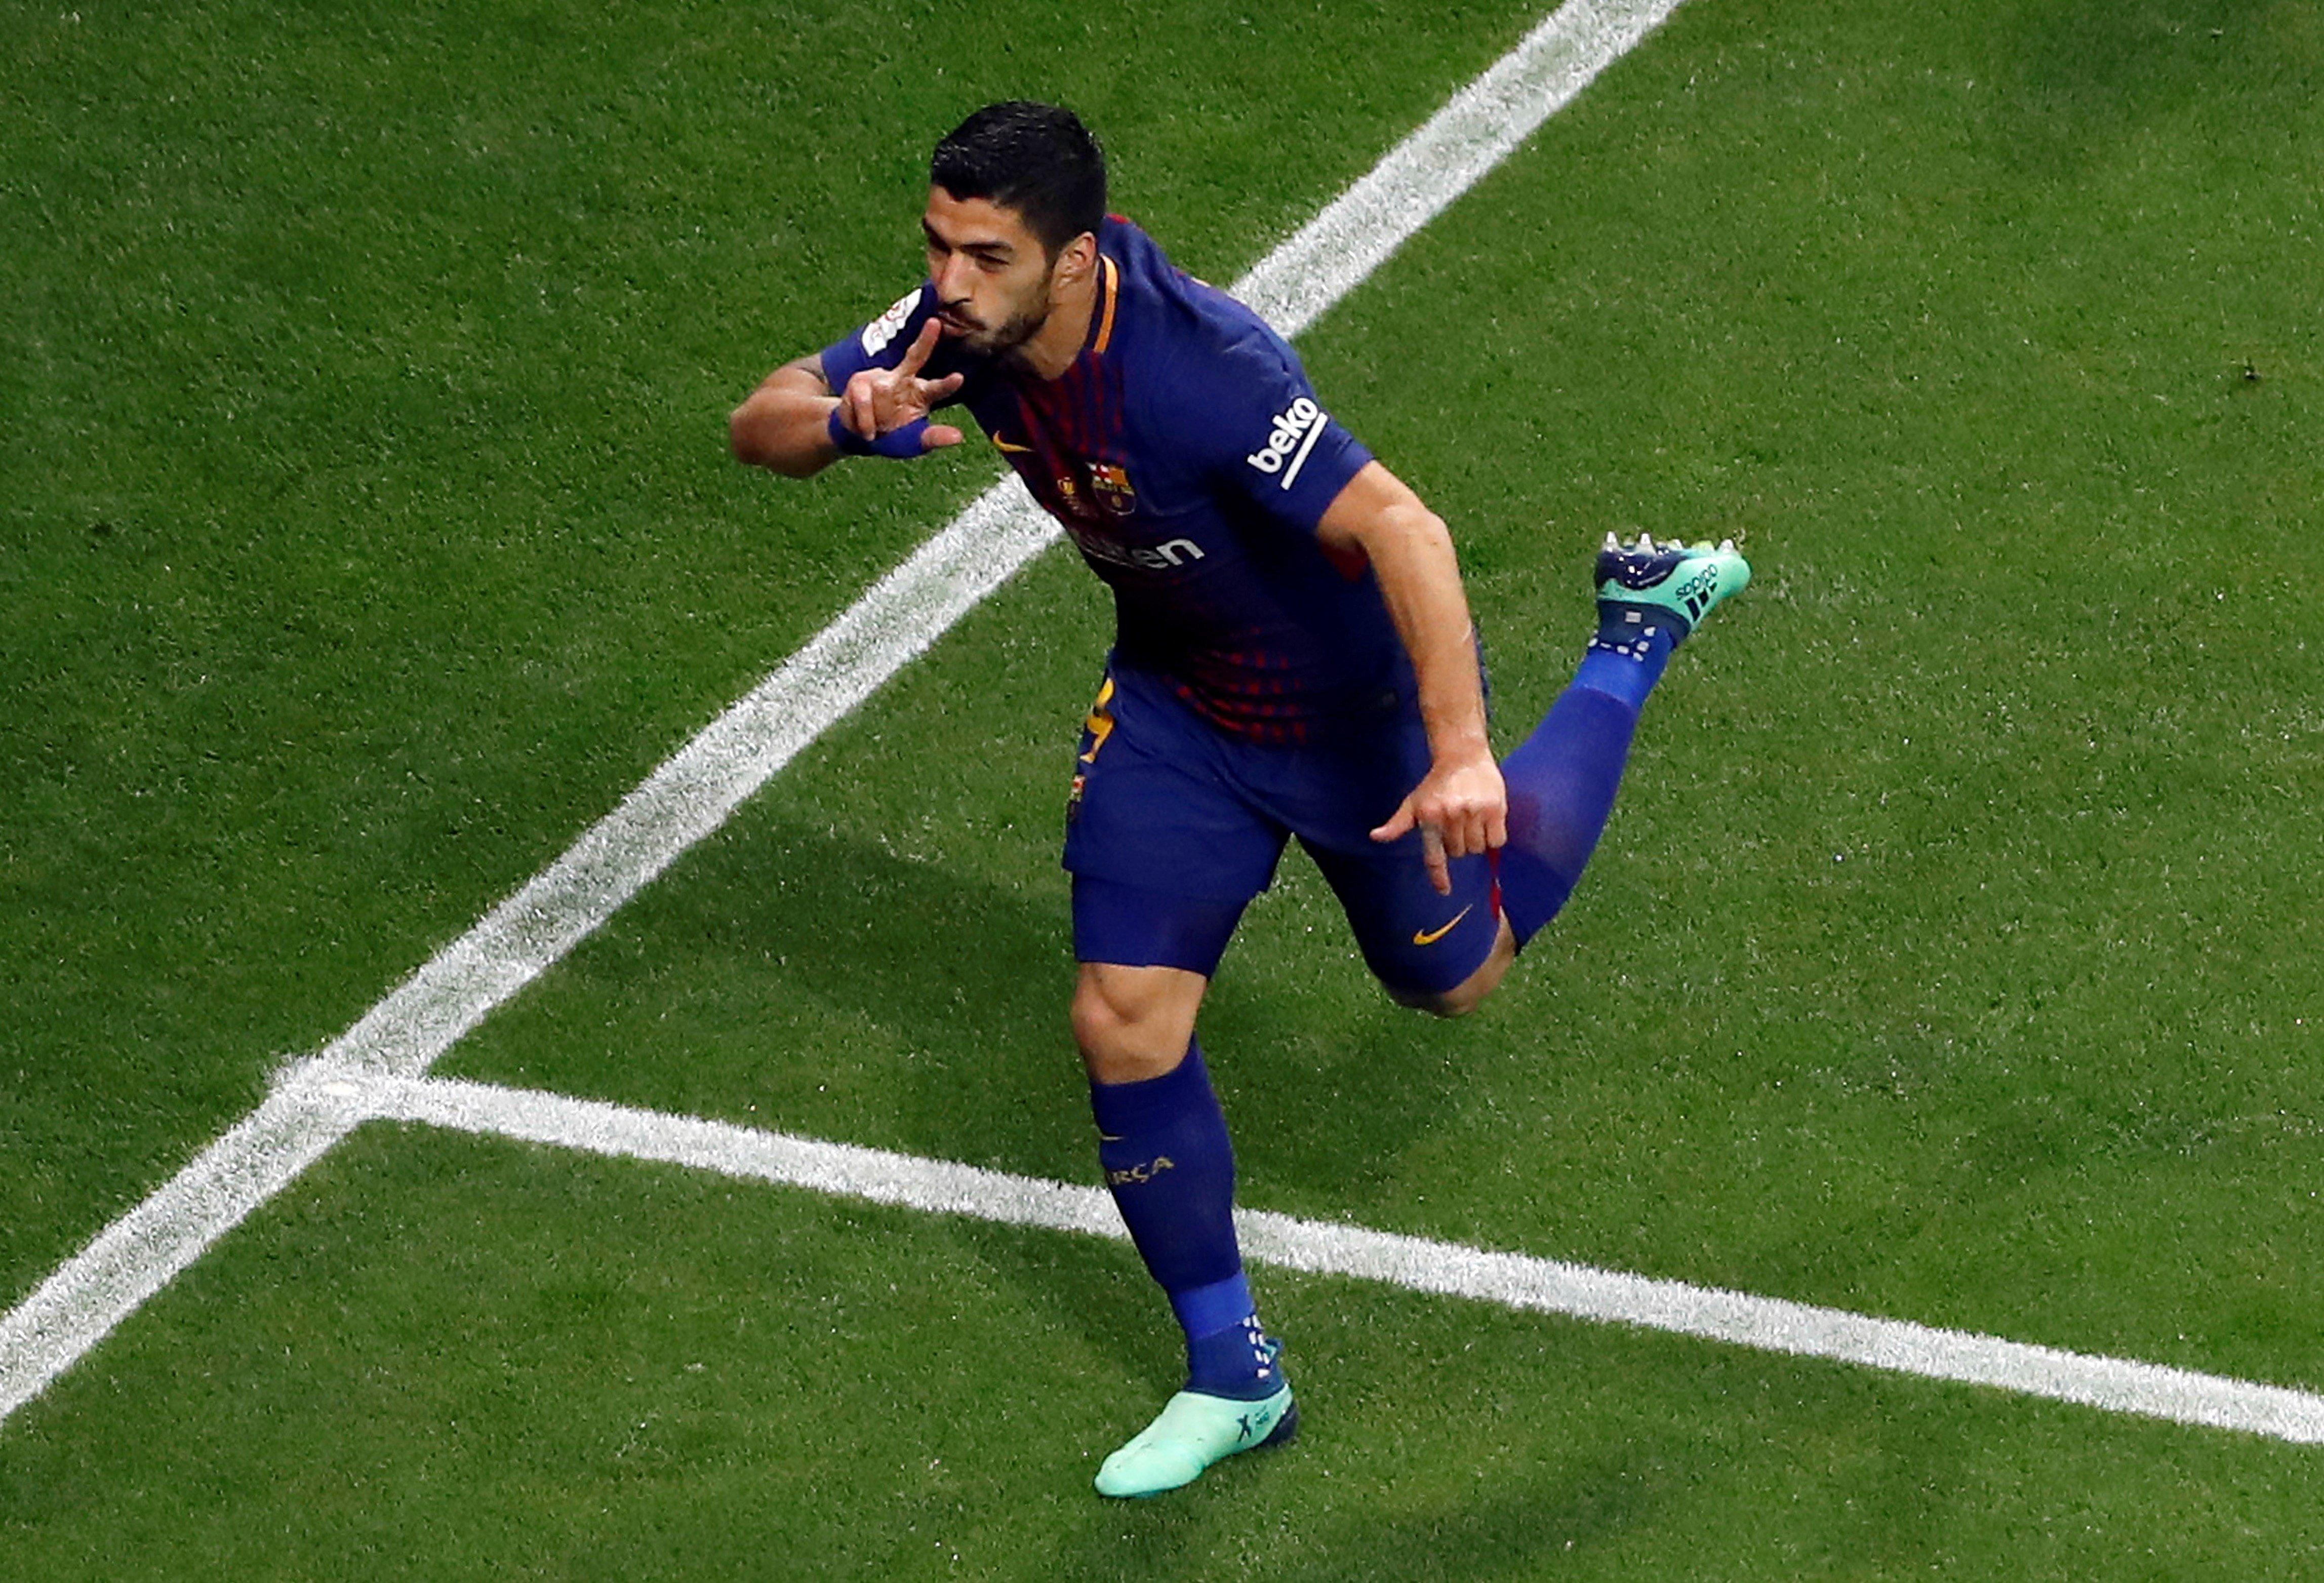 Copa del Rey: Barcelona le ganó la final a Sevilla 5-0 con dos goles ...